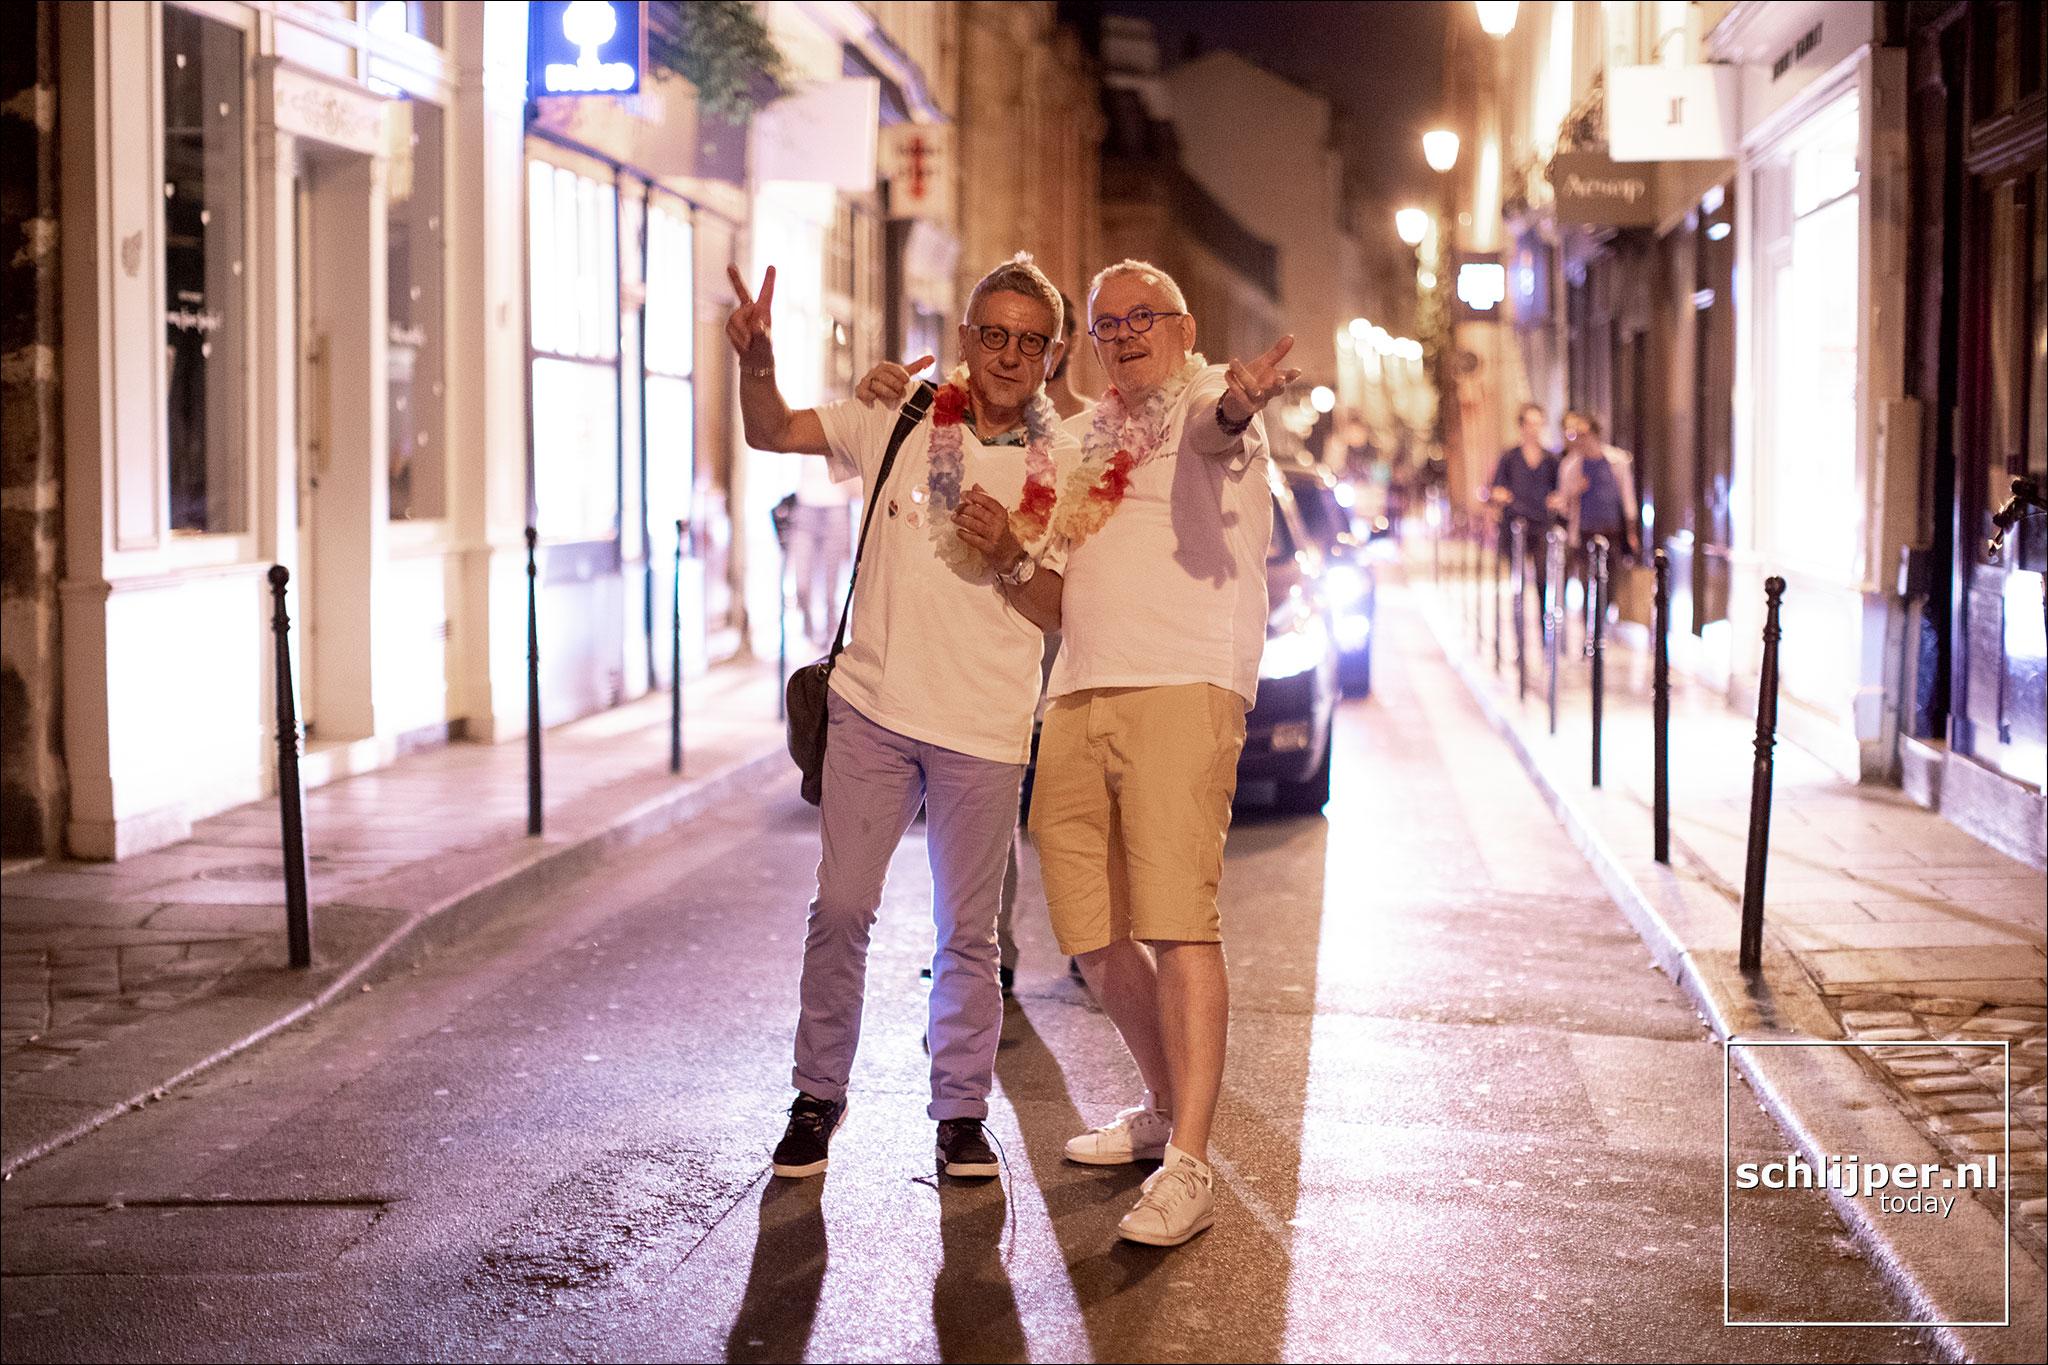 dating in Parijs Frankrijk gratis dating sites Caribbean